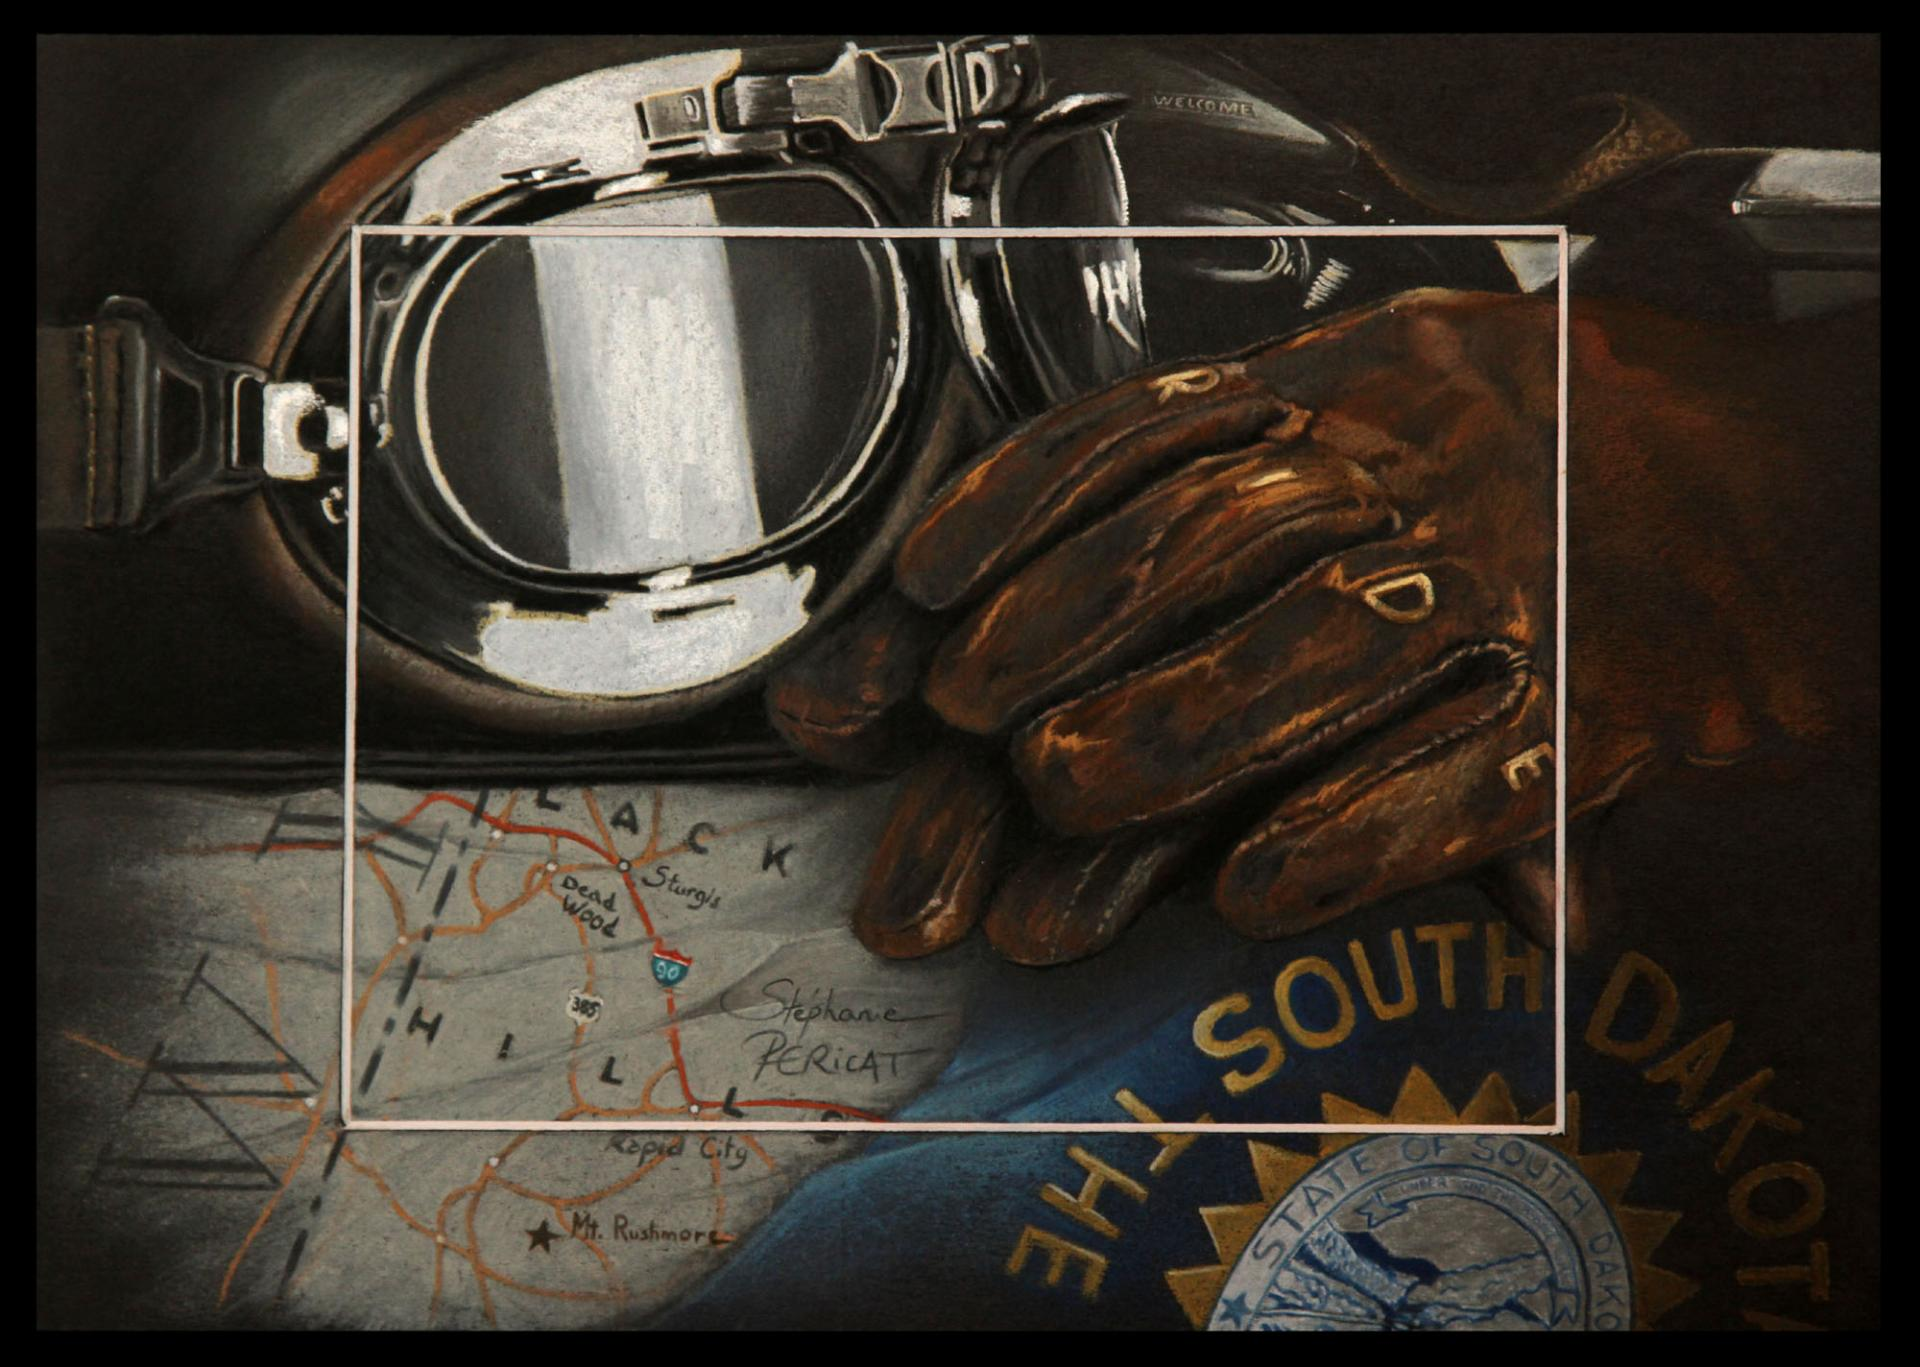 WELCOME RIDERS (bienvenue les motards) -pastel sec (soft pastel) - 20x30cm - AV for sale